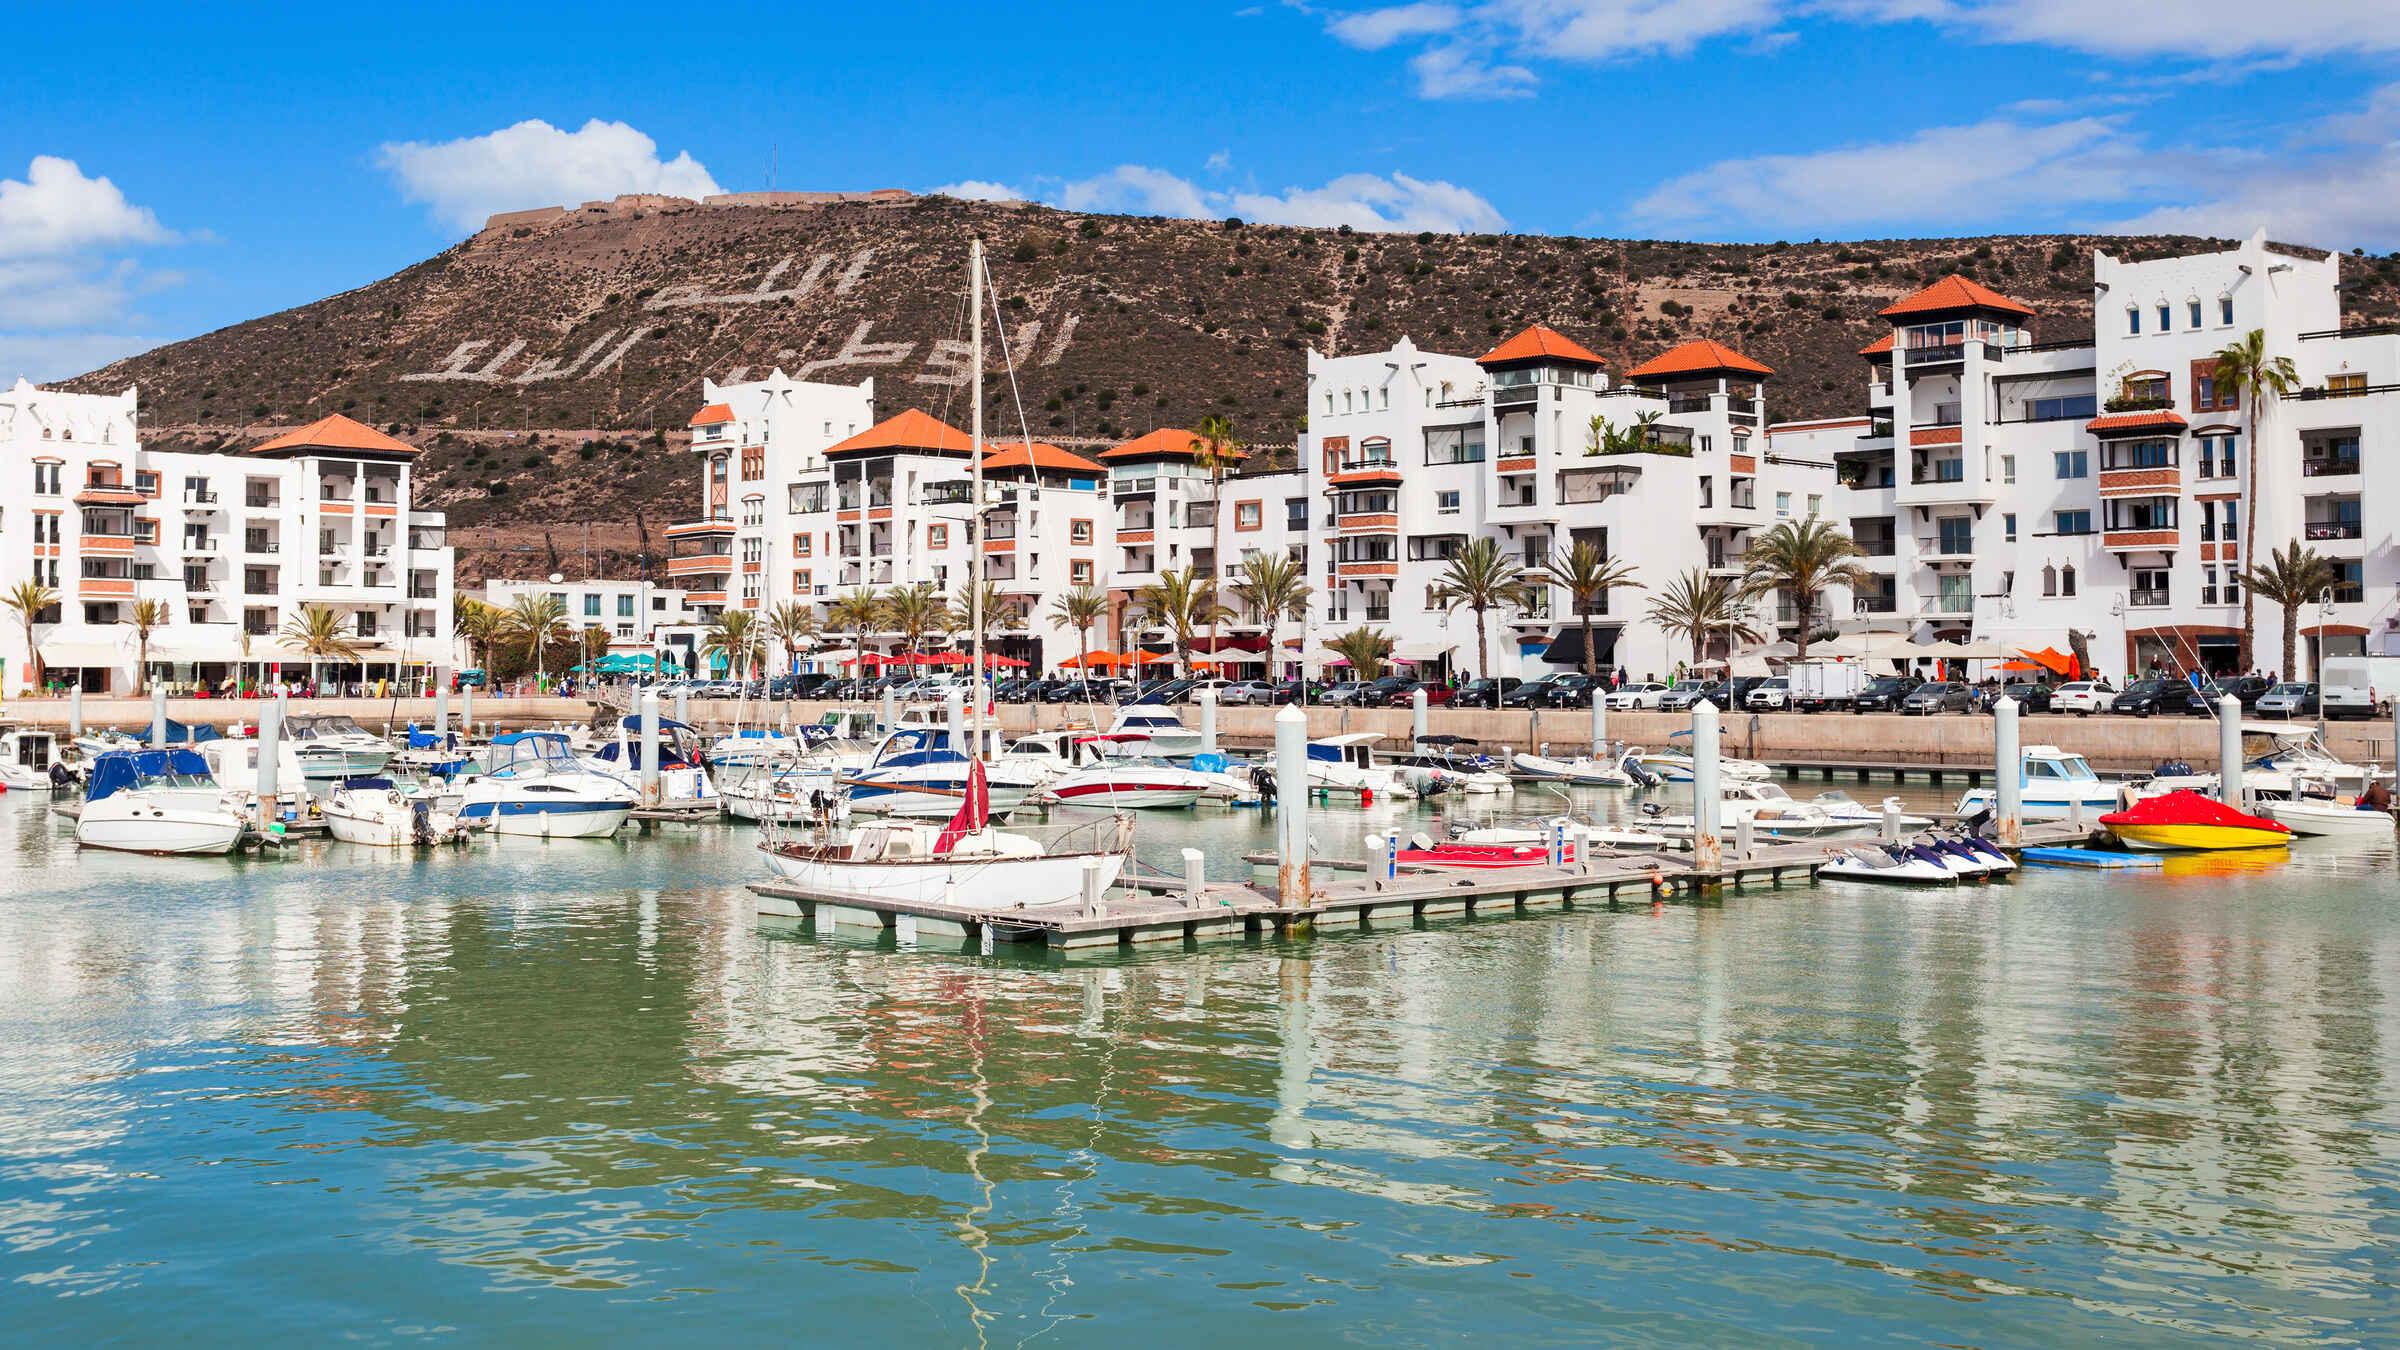 viajes-rutas- marruecos.jpg tours from agadir